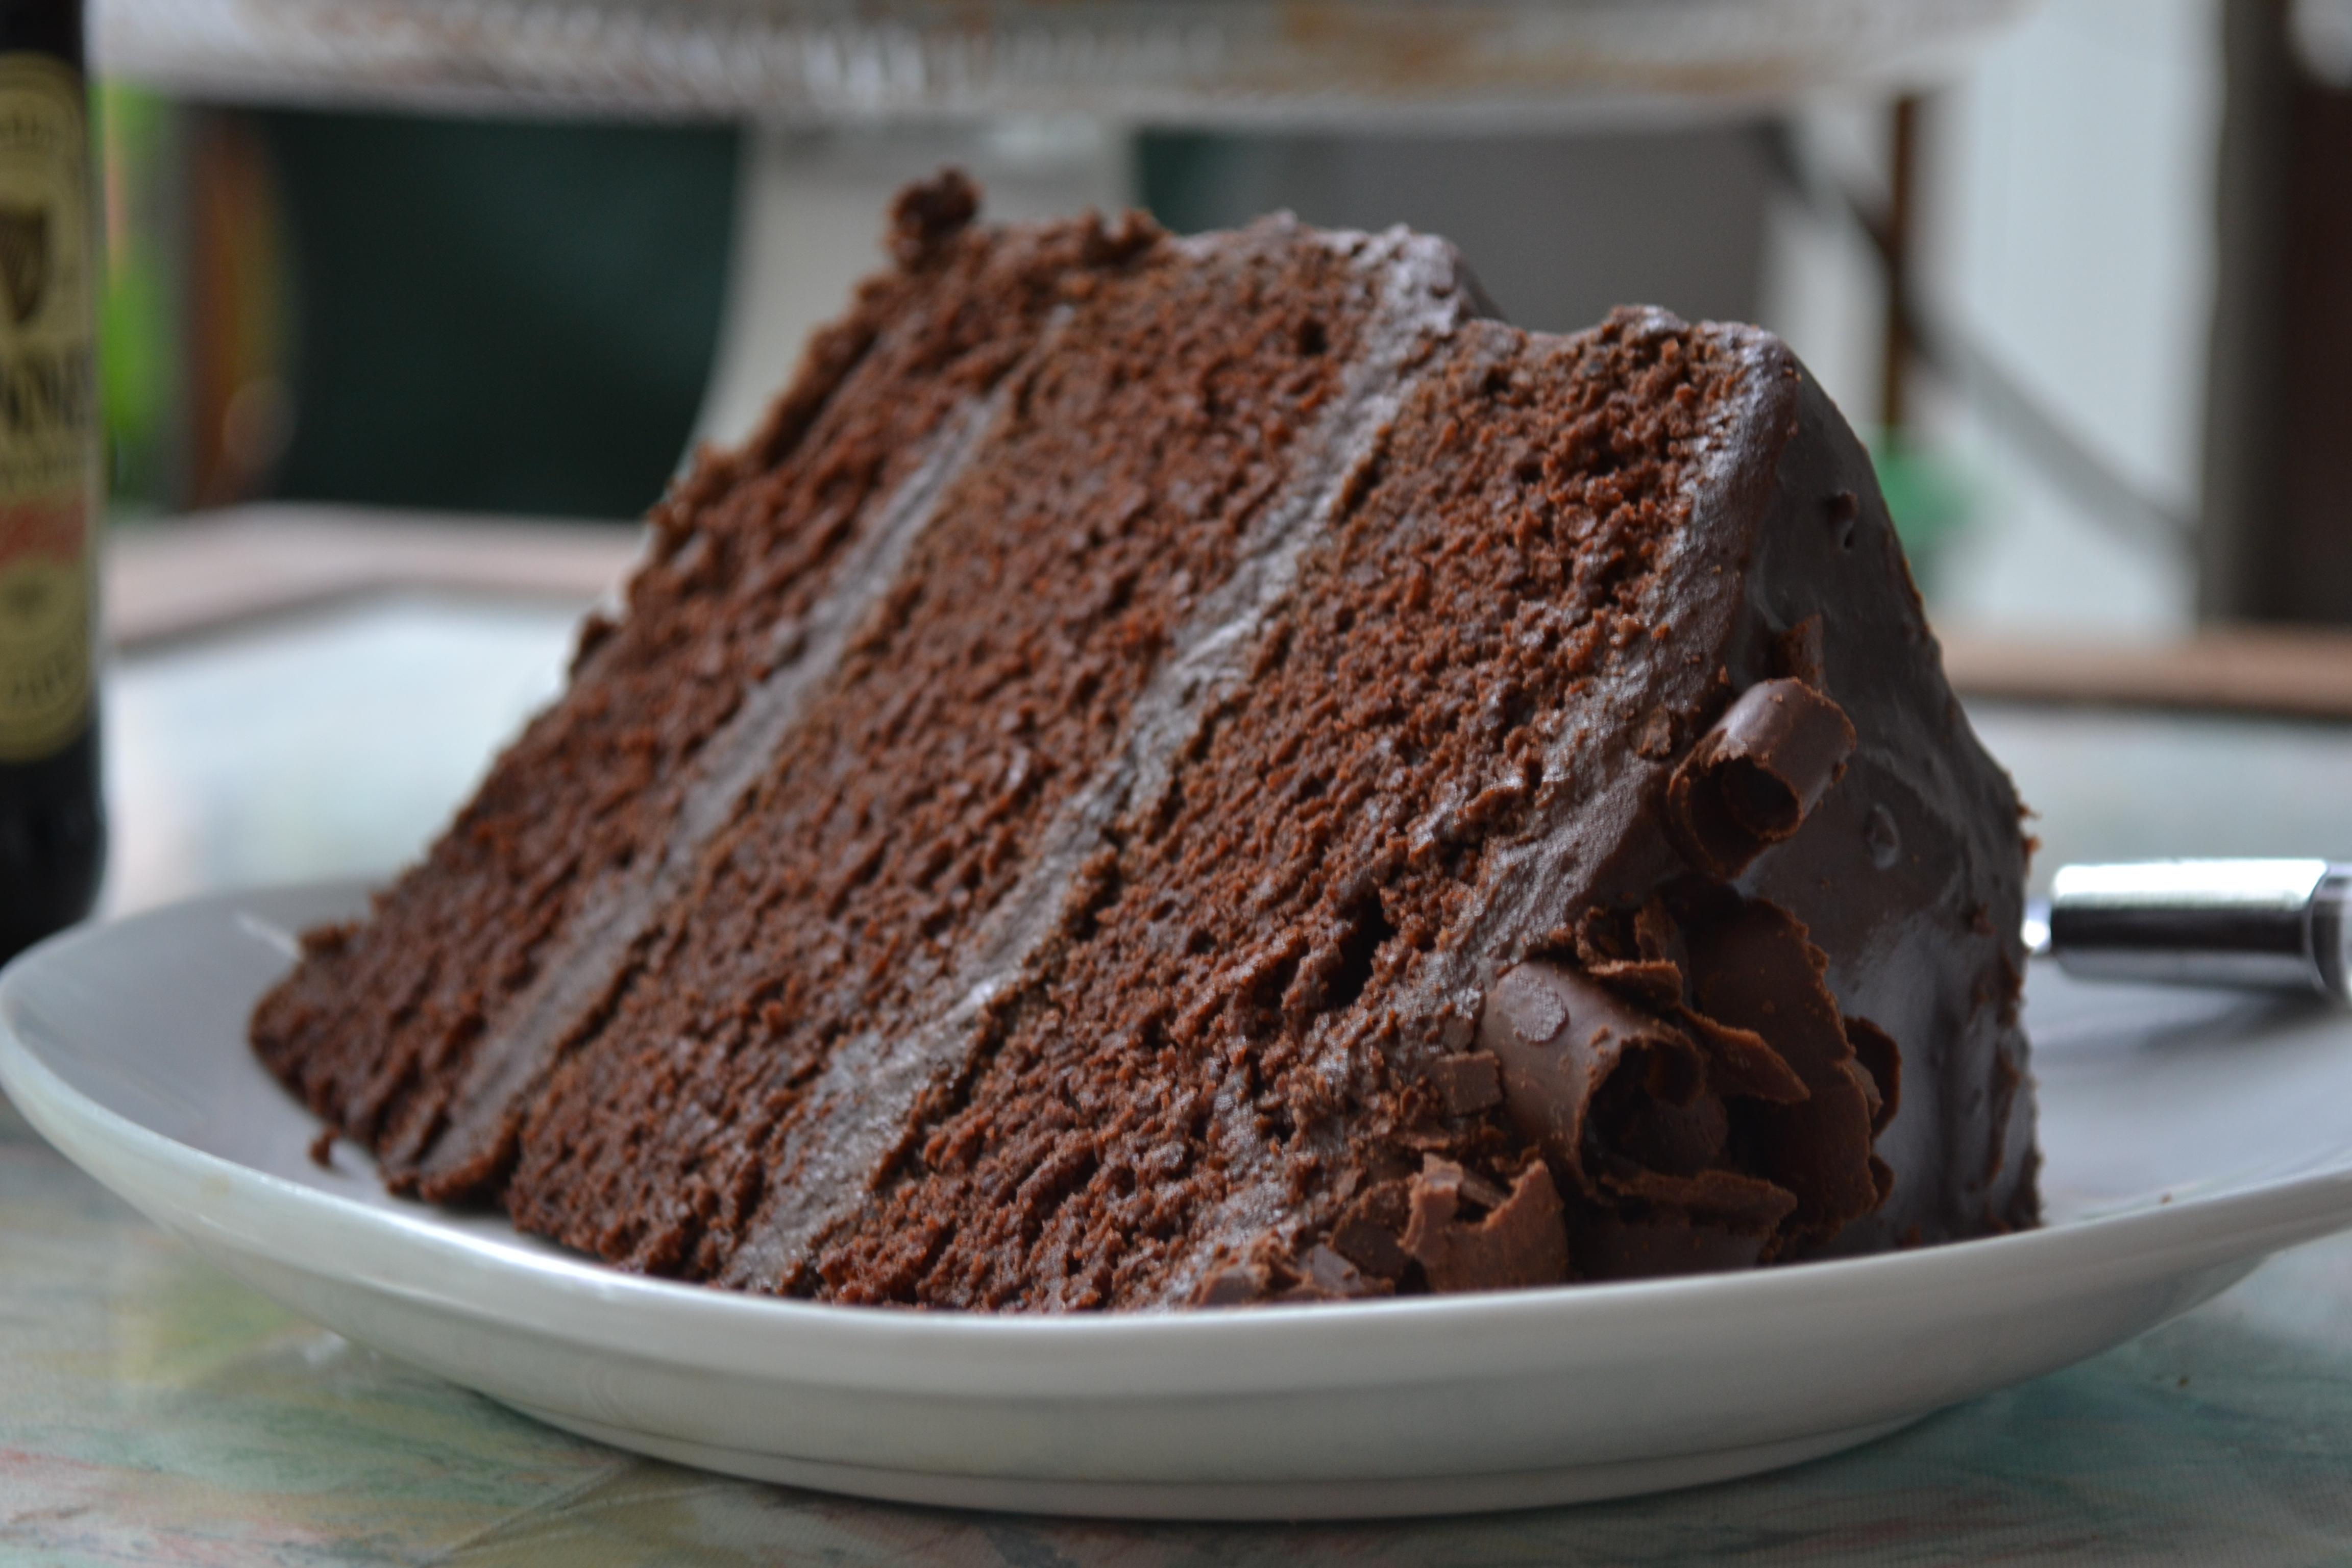 Epicurious chocolate stout cake recipe - Best cake recipes